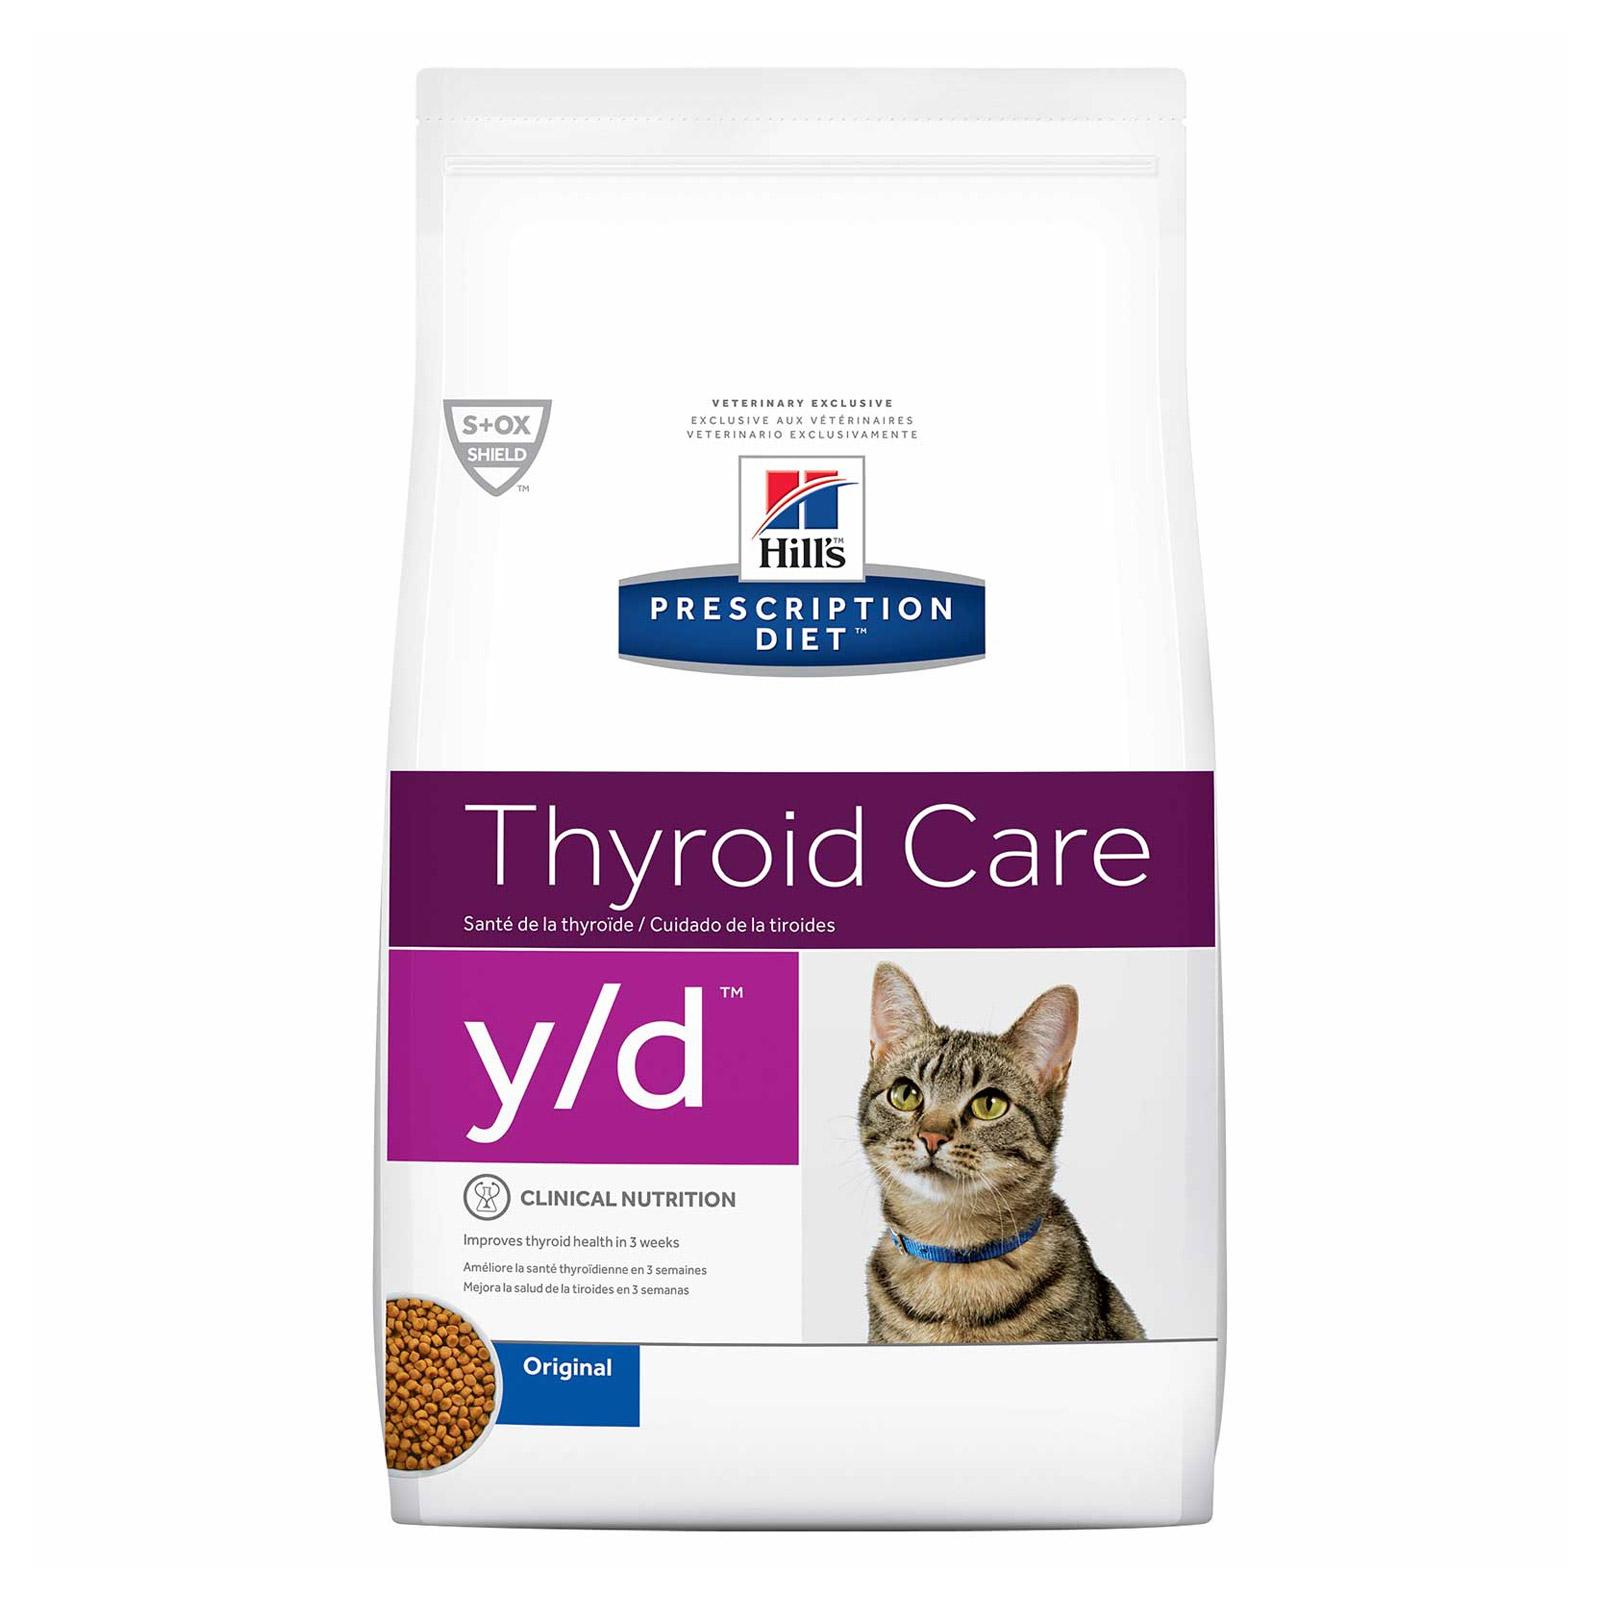 Hill's Prescription Diet Feline y/d Thyroid Care Dry